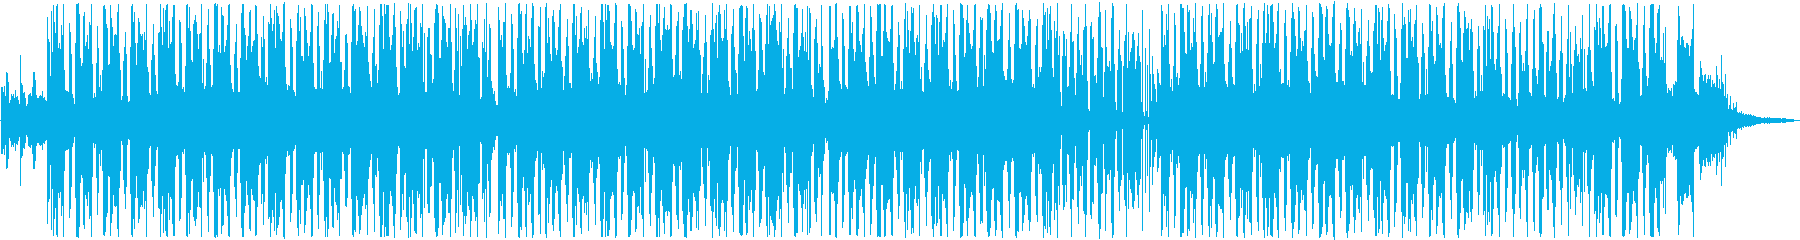 Avant-garde hip hop type beat's reproduced waveform